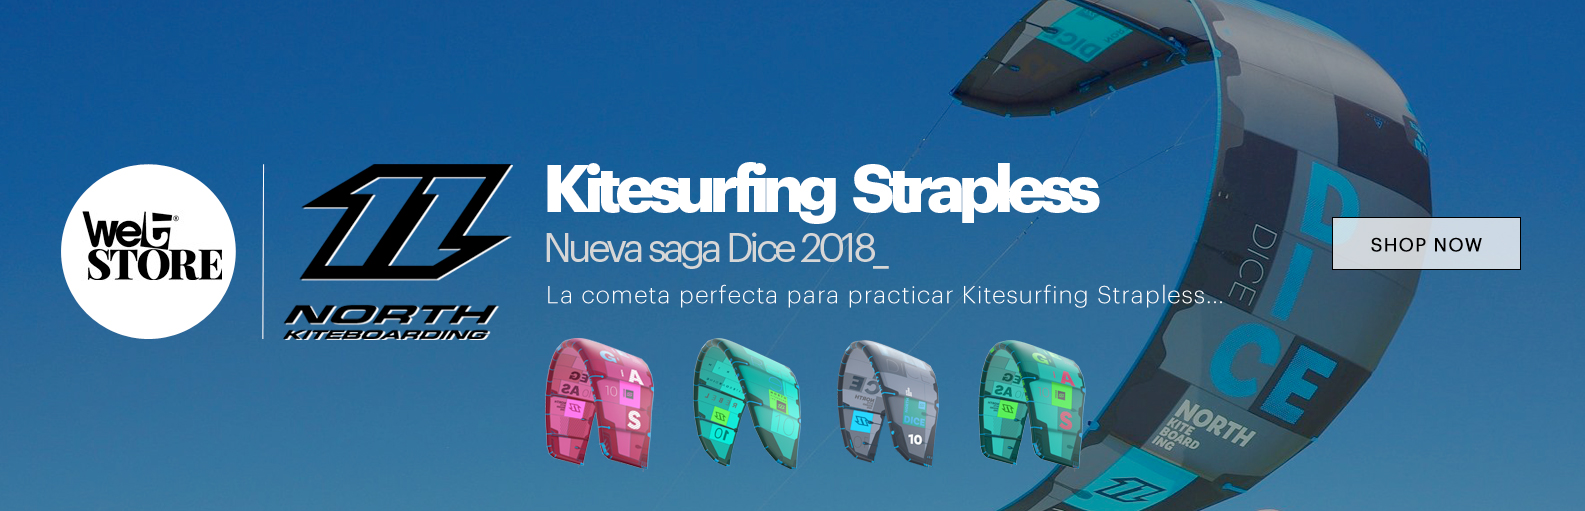 banner-strapless-dice-2018